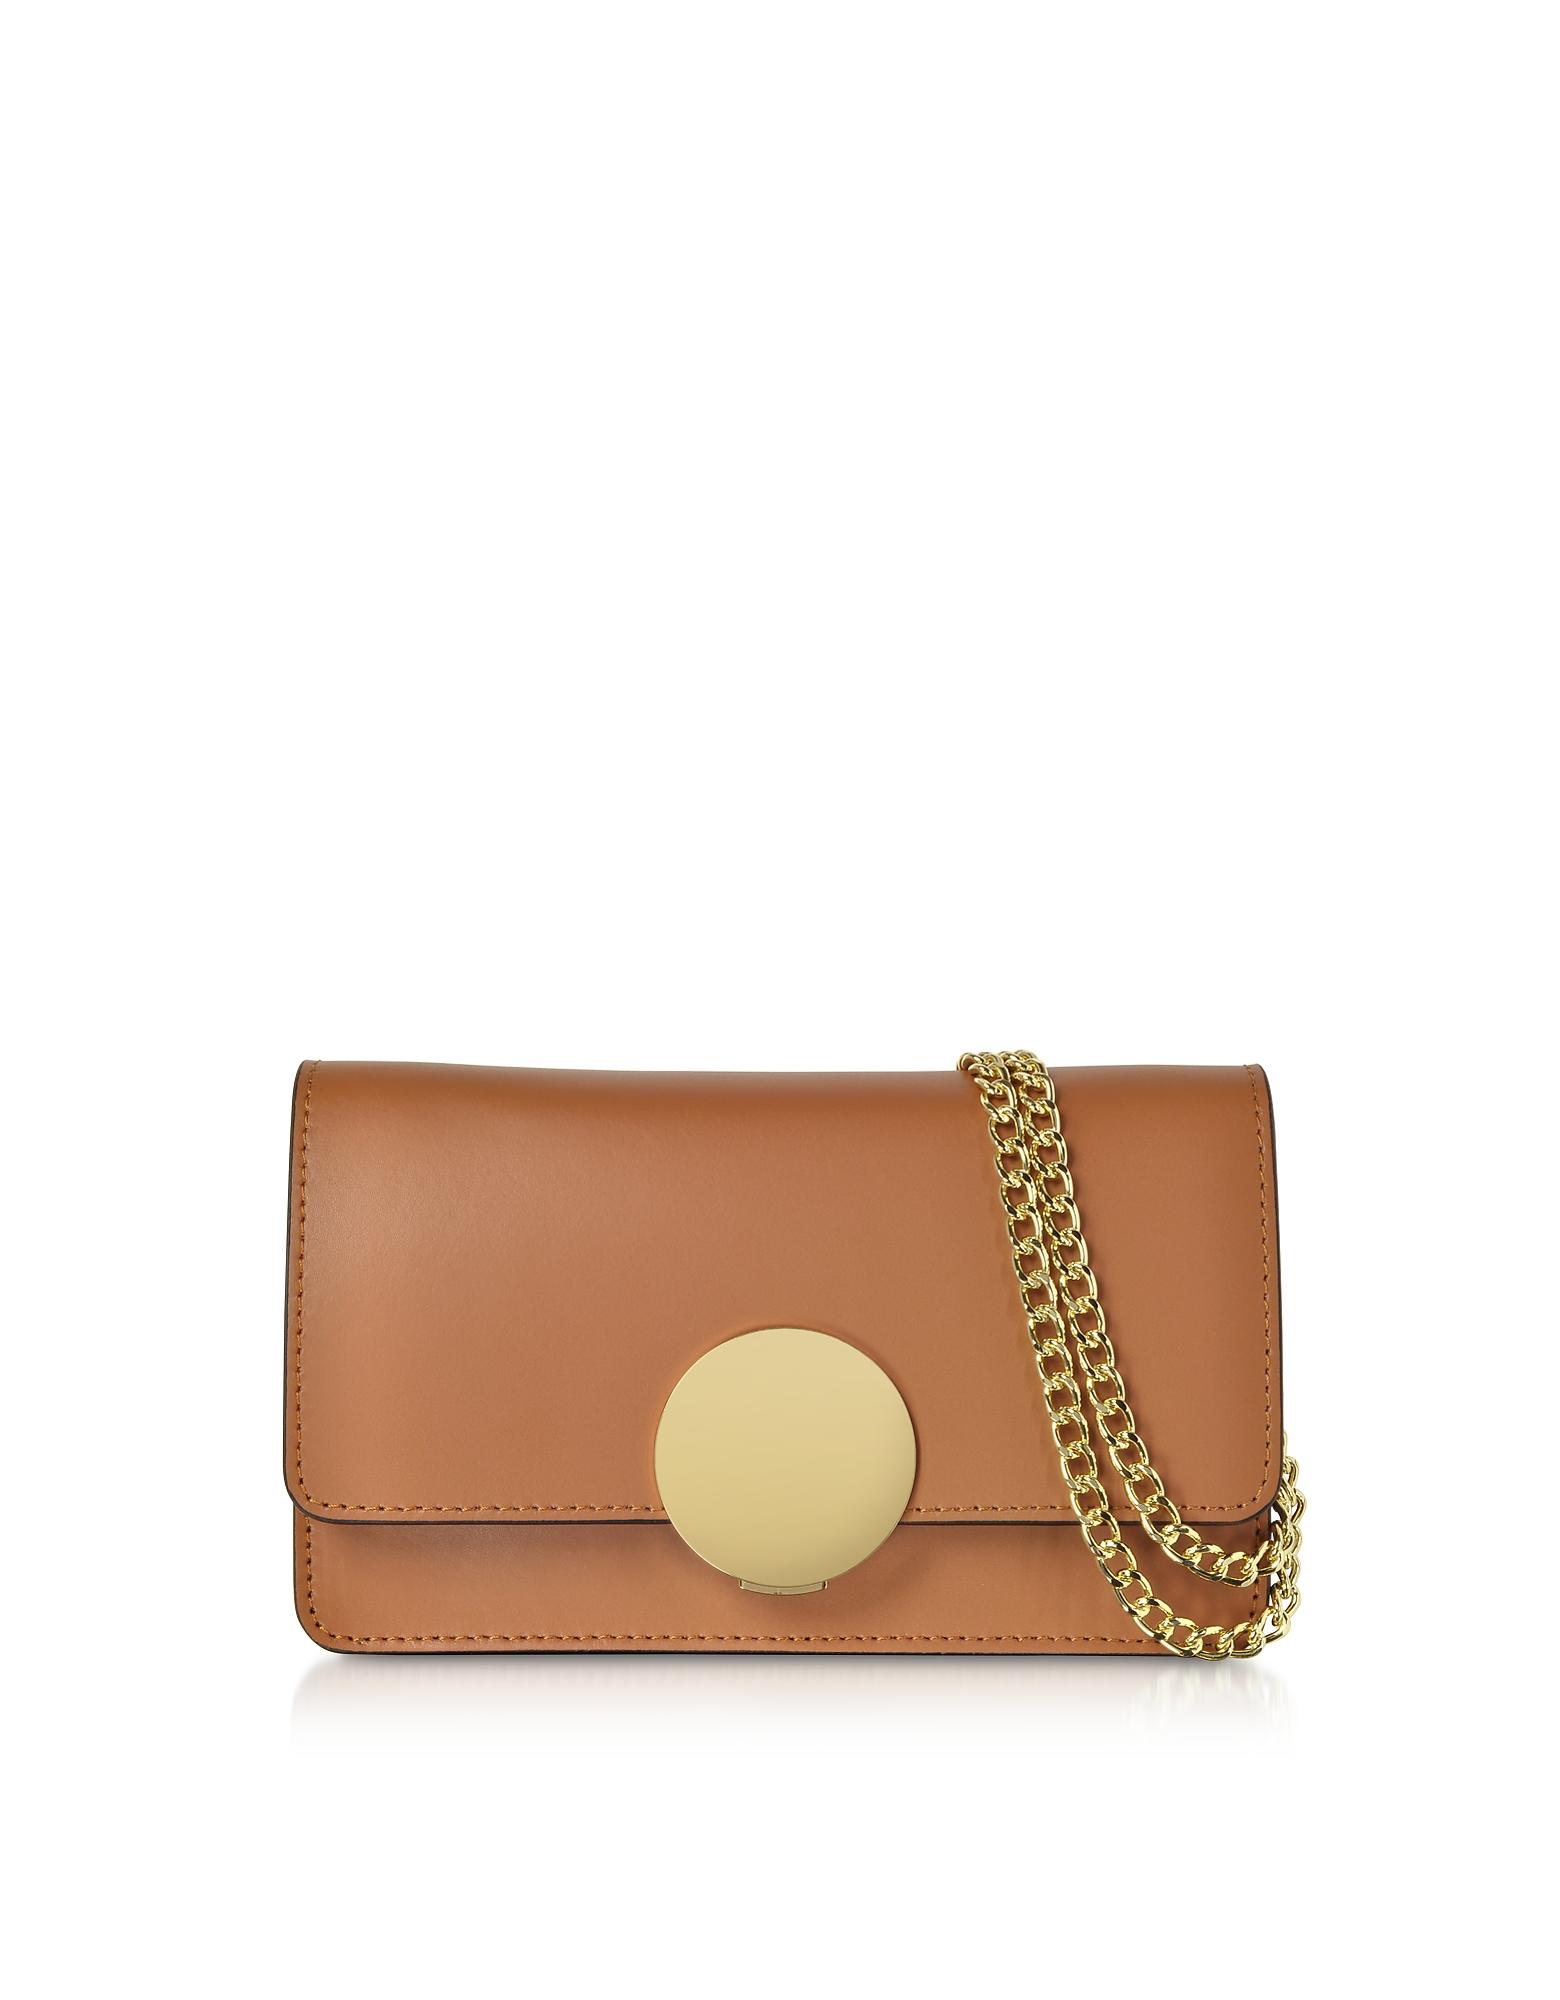 Le Parmentier Designer Handbags, New Ondina Nano Leather and Suede Crossbody Clutch